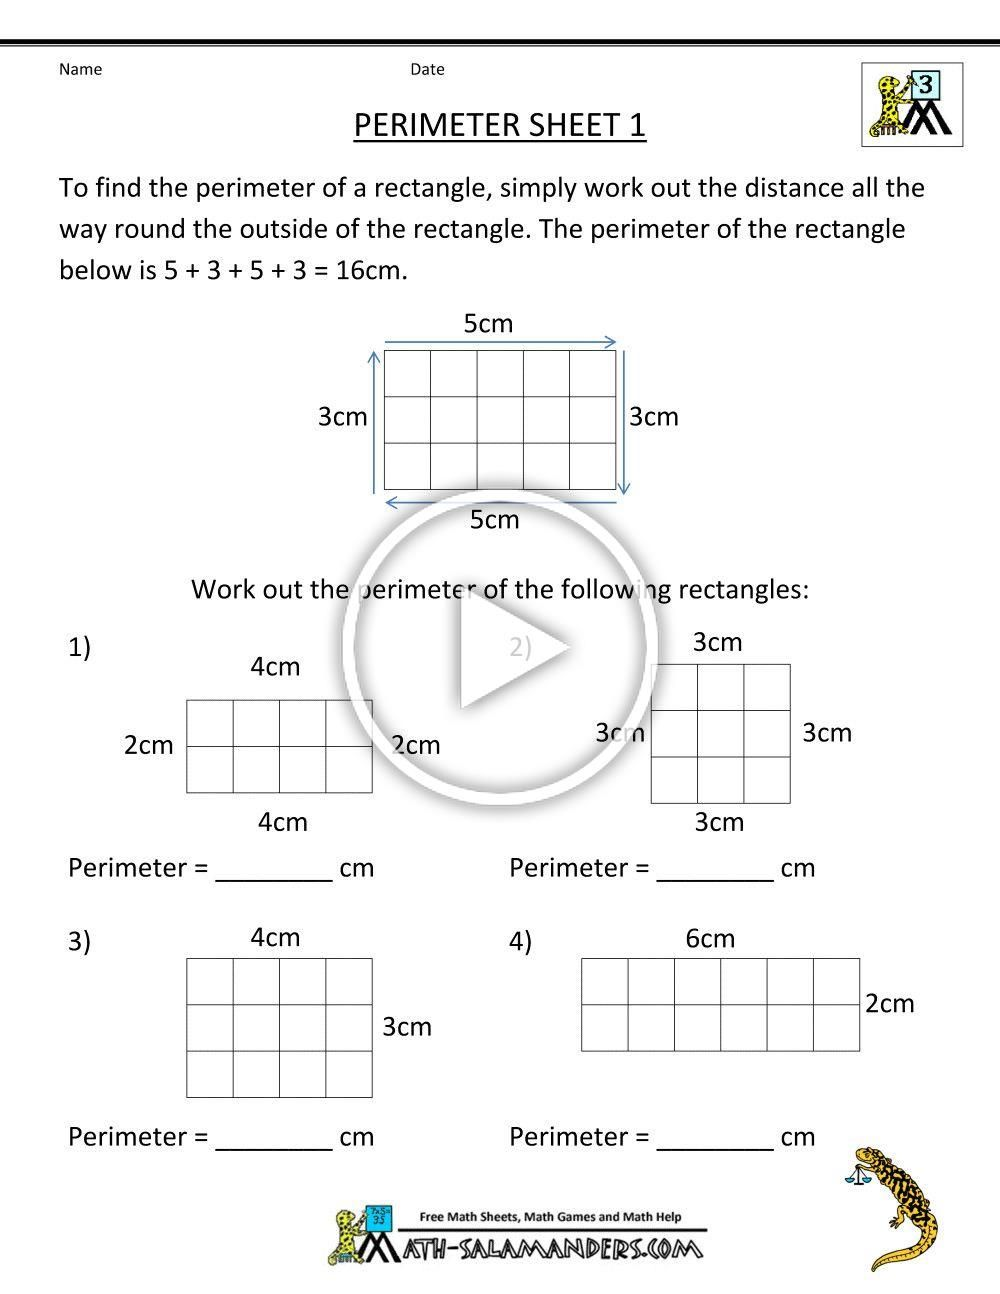 hight resolution of 2 Capacity Worksheets Grade 2 free 3rd grade math worksheets perimeter 1 √  Capacity Worksheets Grade 2 . 2 Capacity Worksheets Grade 2 . Inches  Measurement Work… in 2020